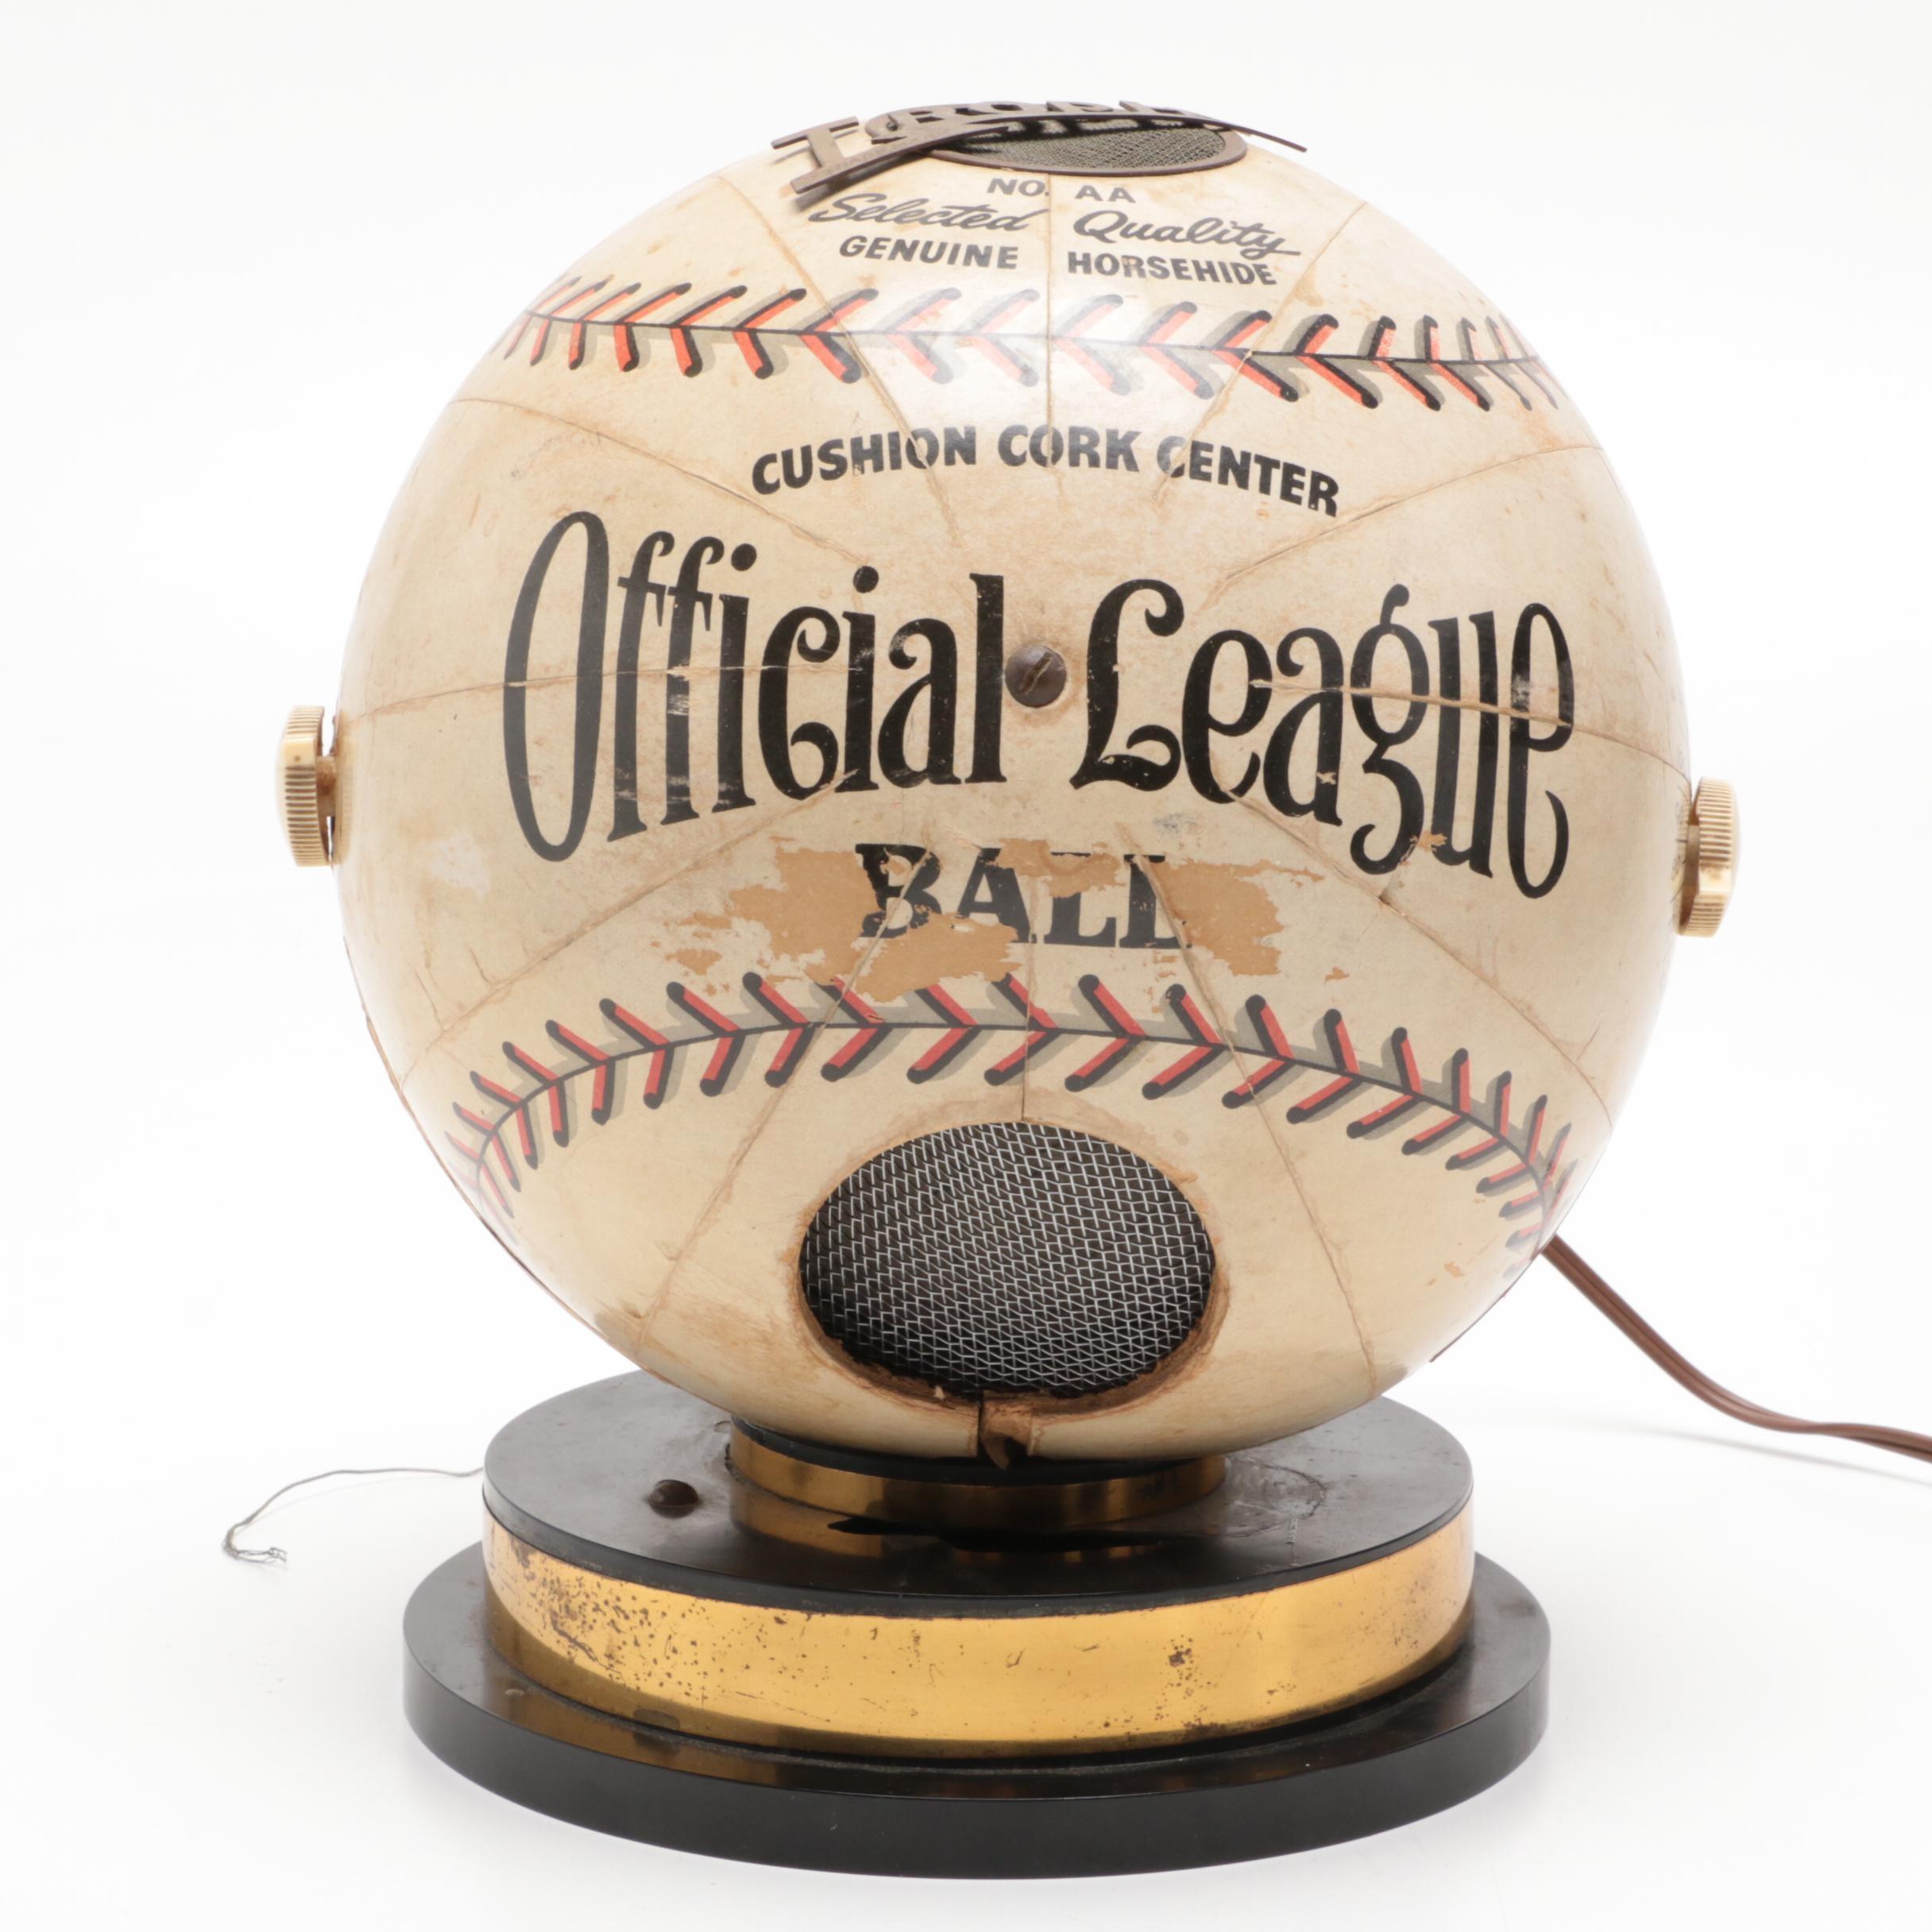 1941 Official League Baseball Radio Trophy